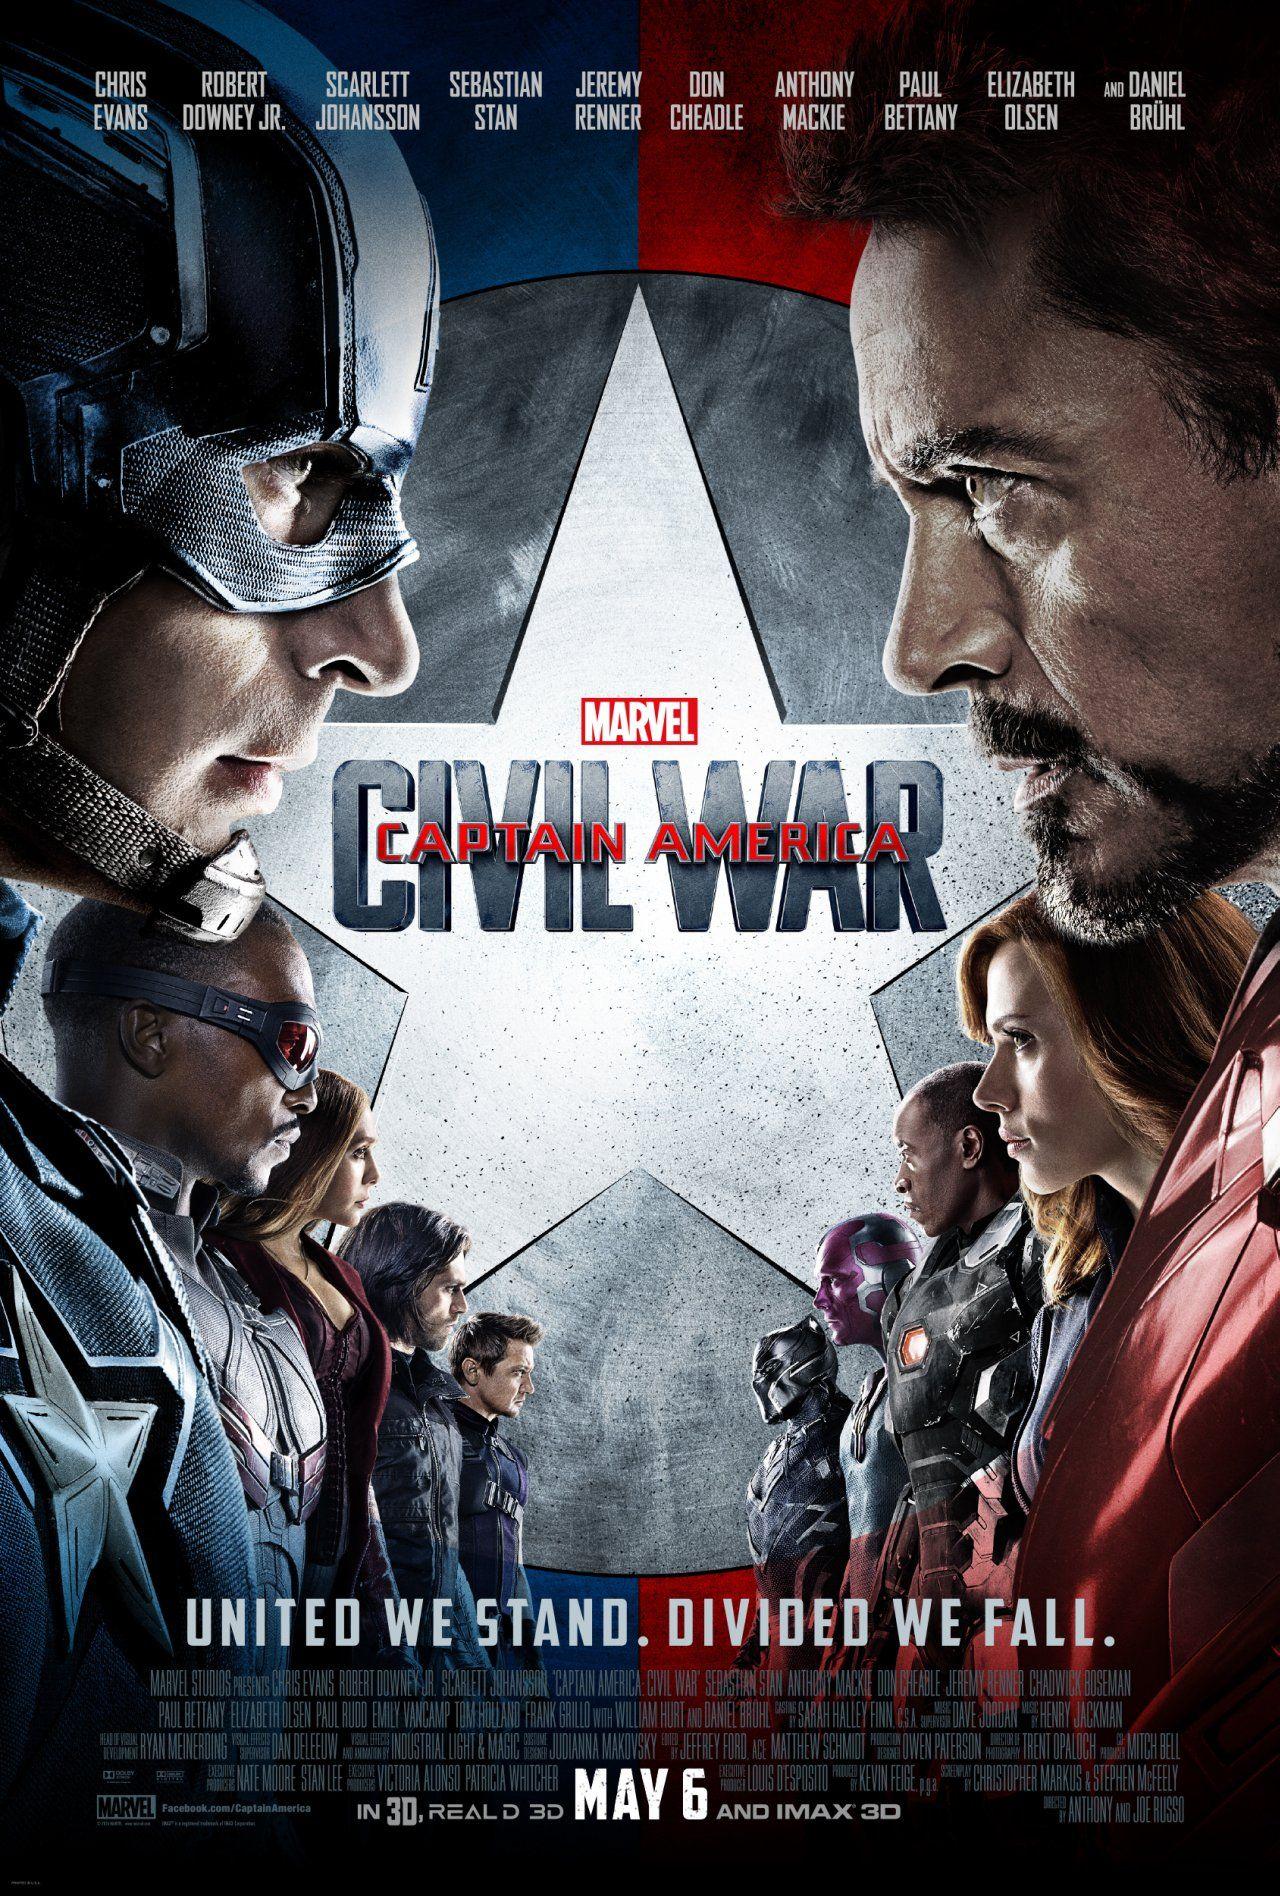 New Captain America Civil War Poster Pelicula Capitan America Peliculas De Superheroes Peliculas Marvel